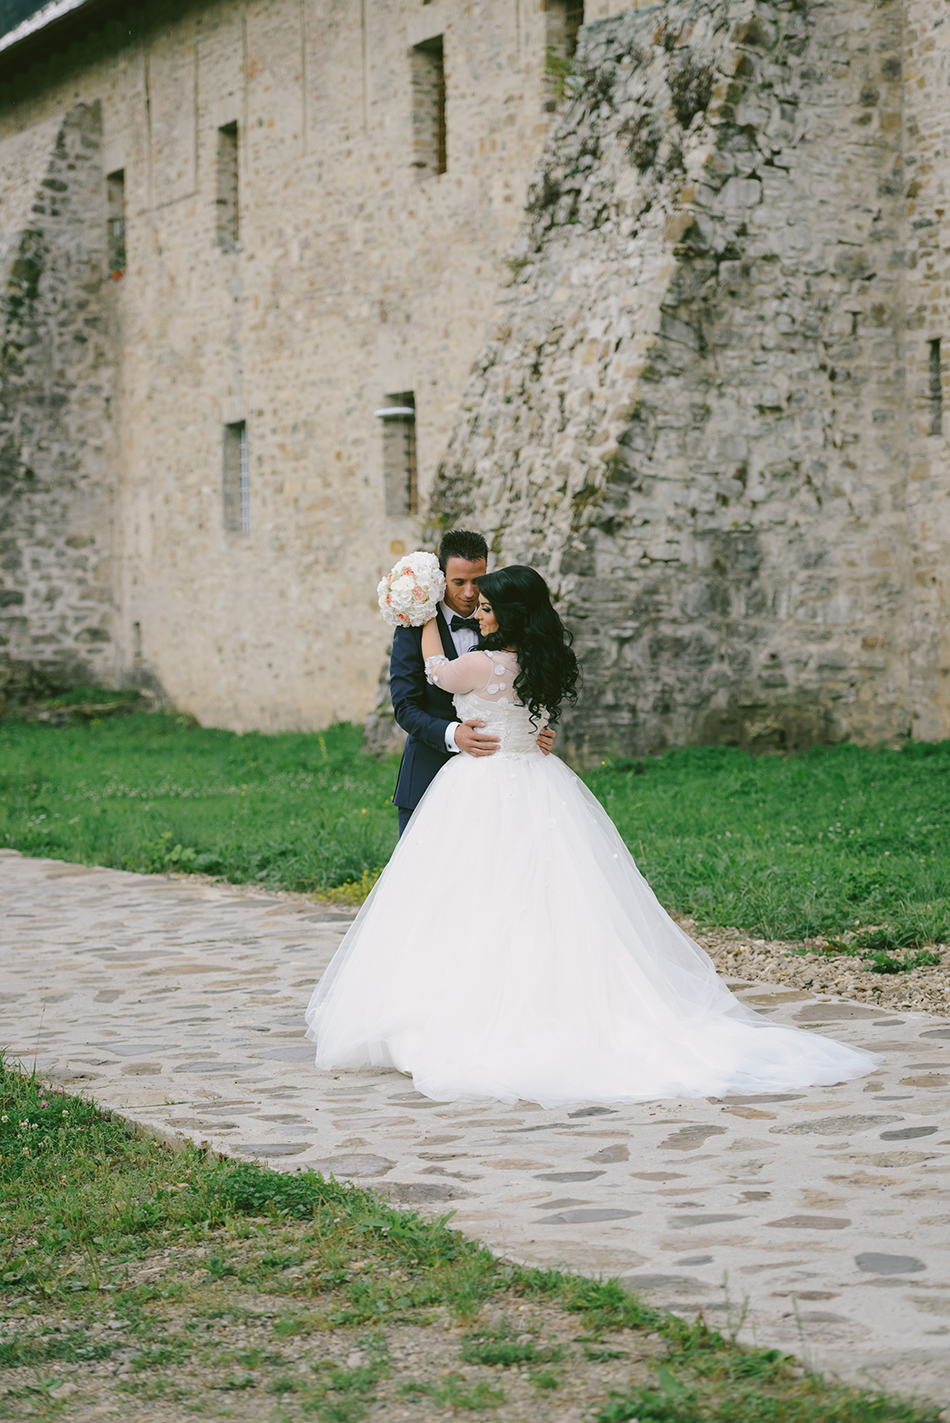 AD Passion Photography | ad-passion_diana-si-gabi_fotograf-nunta-suceava_0066 | Adelin, Dida, fotograf profesionist, fotograf de nunta, fotografie de nunta, fotograf Timisoara, fotograf Craiova, fotograf Bucuresti, fotograf Arad, nunta Timisoara, nunta Arad, nunta Bucuresti, nunta Craiova